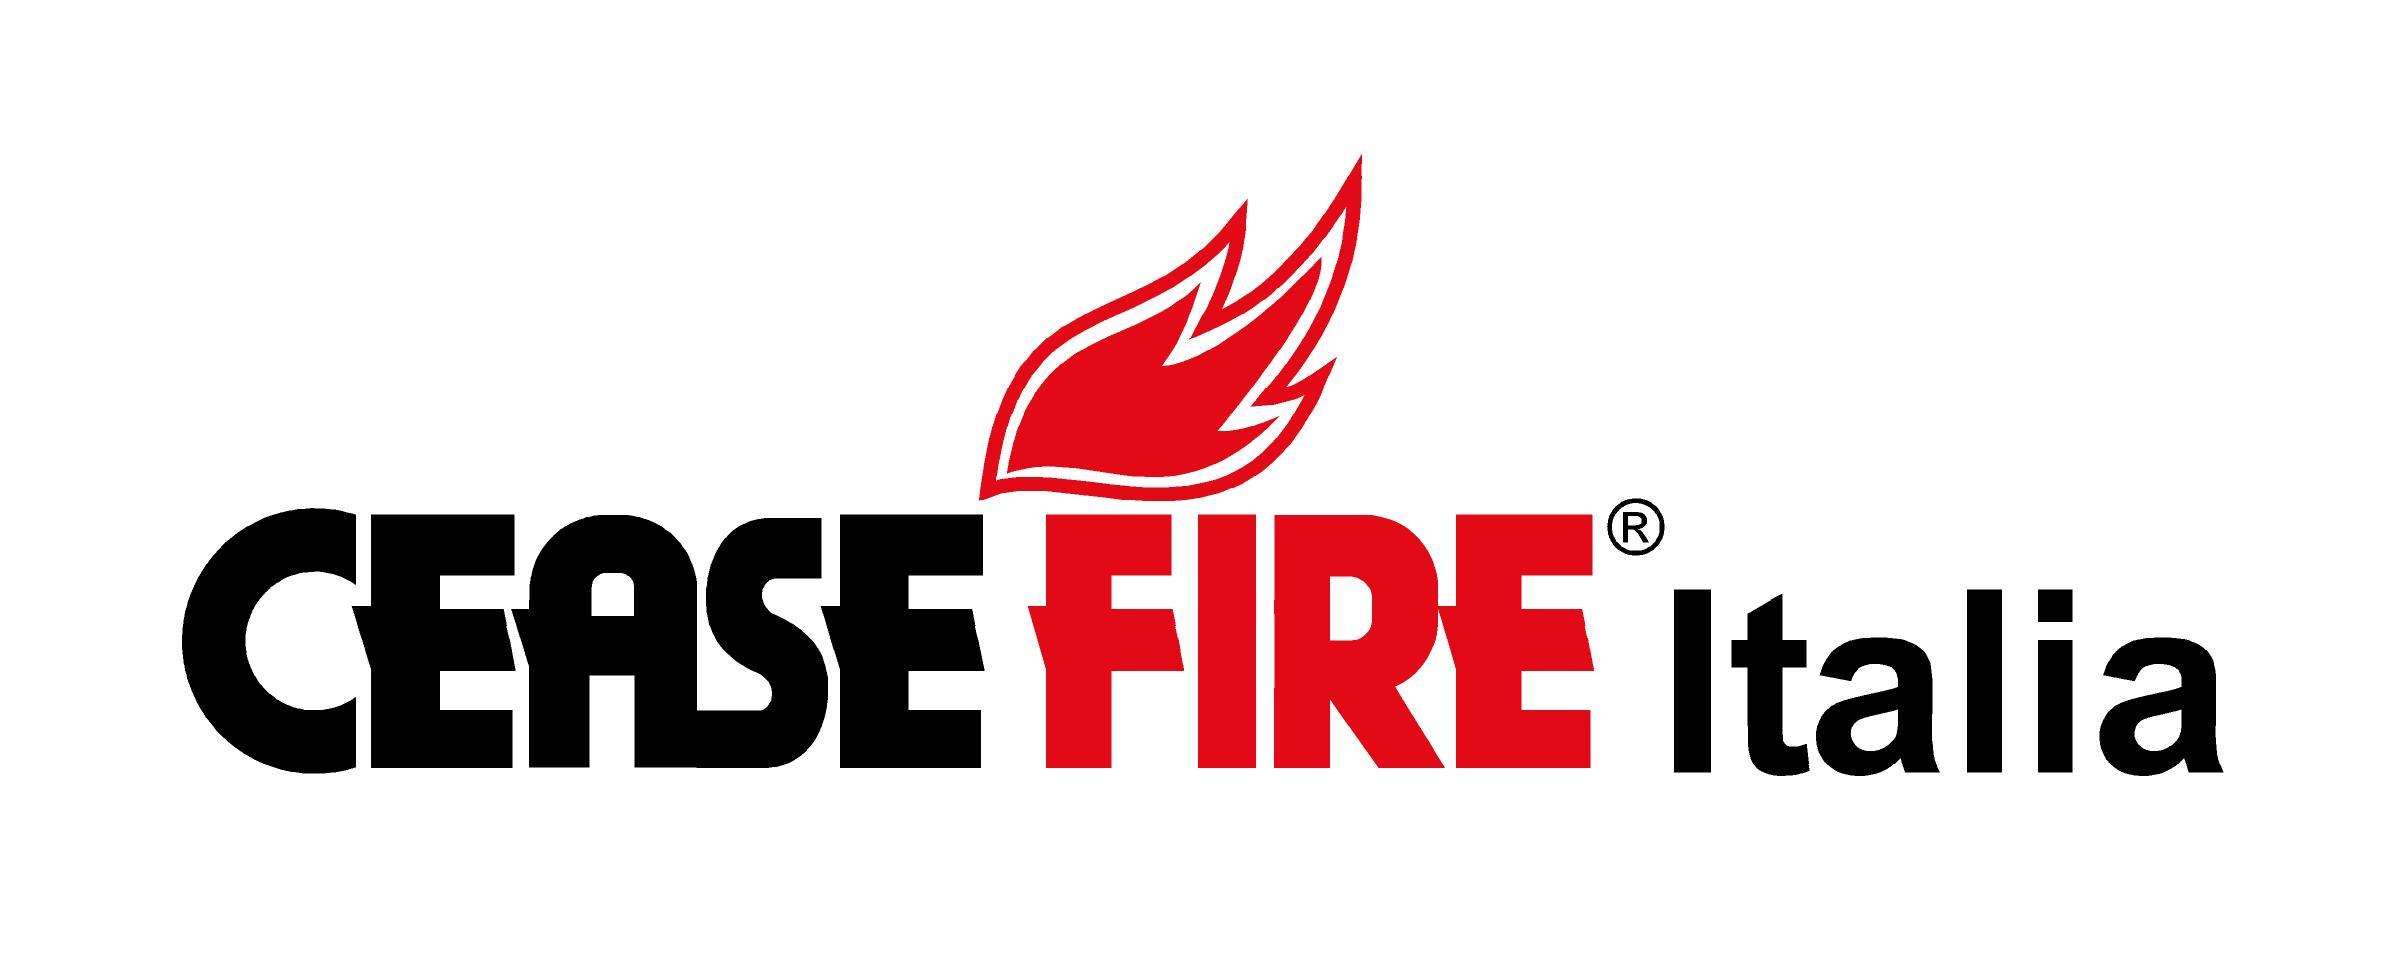 Cease Fire Italia